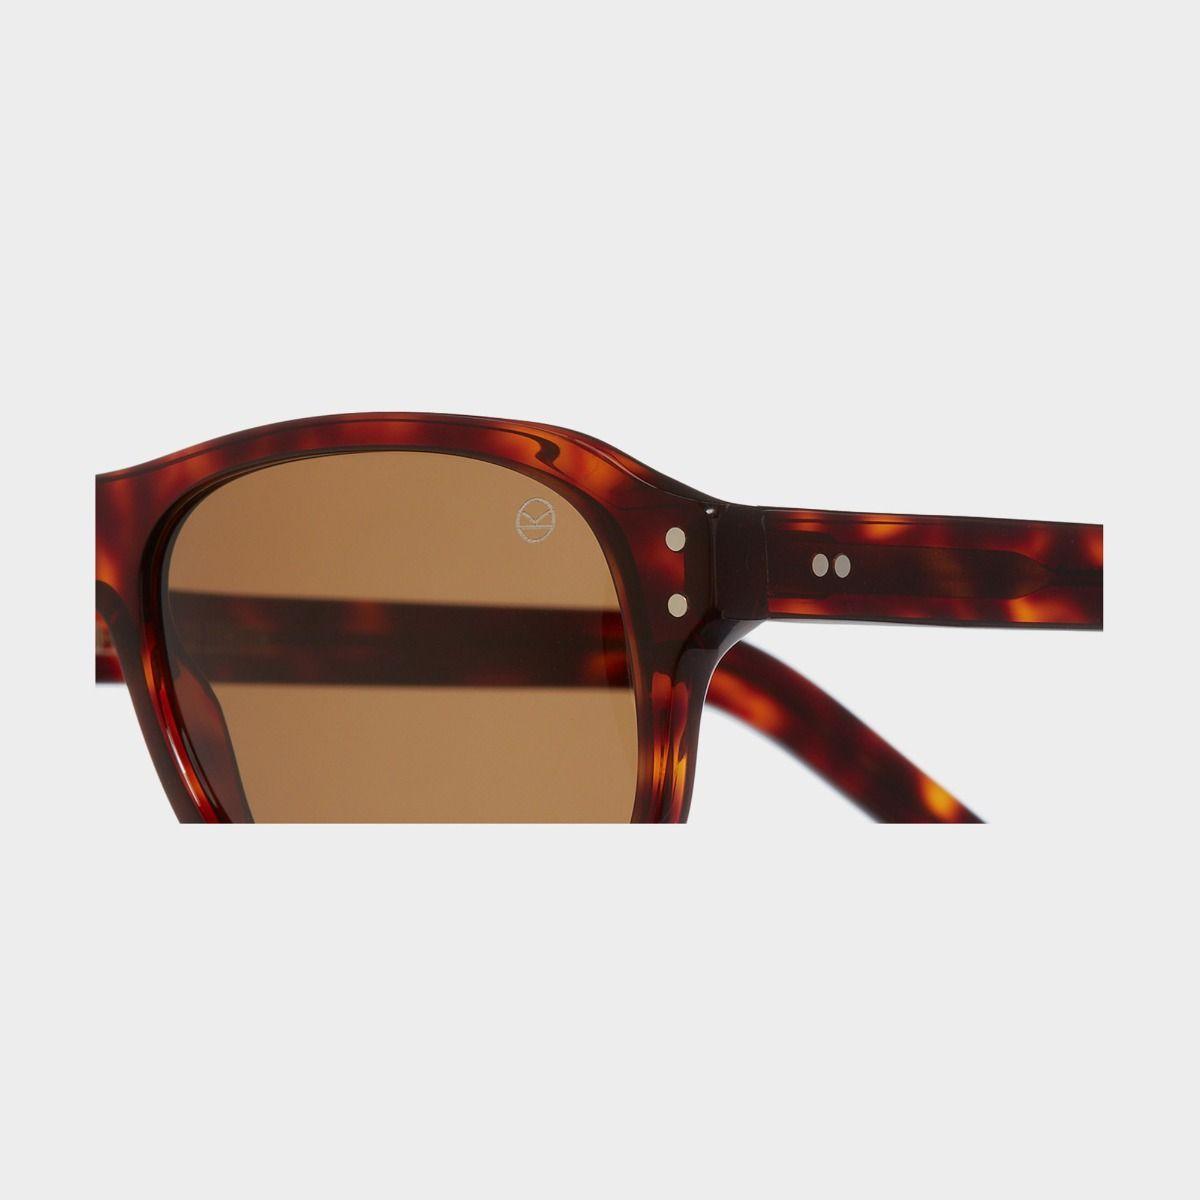 0847V2 Kingsman Aviator Sunglasses (Large)